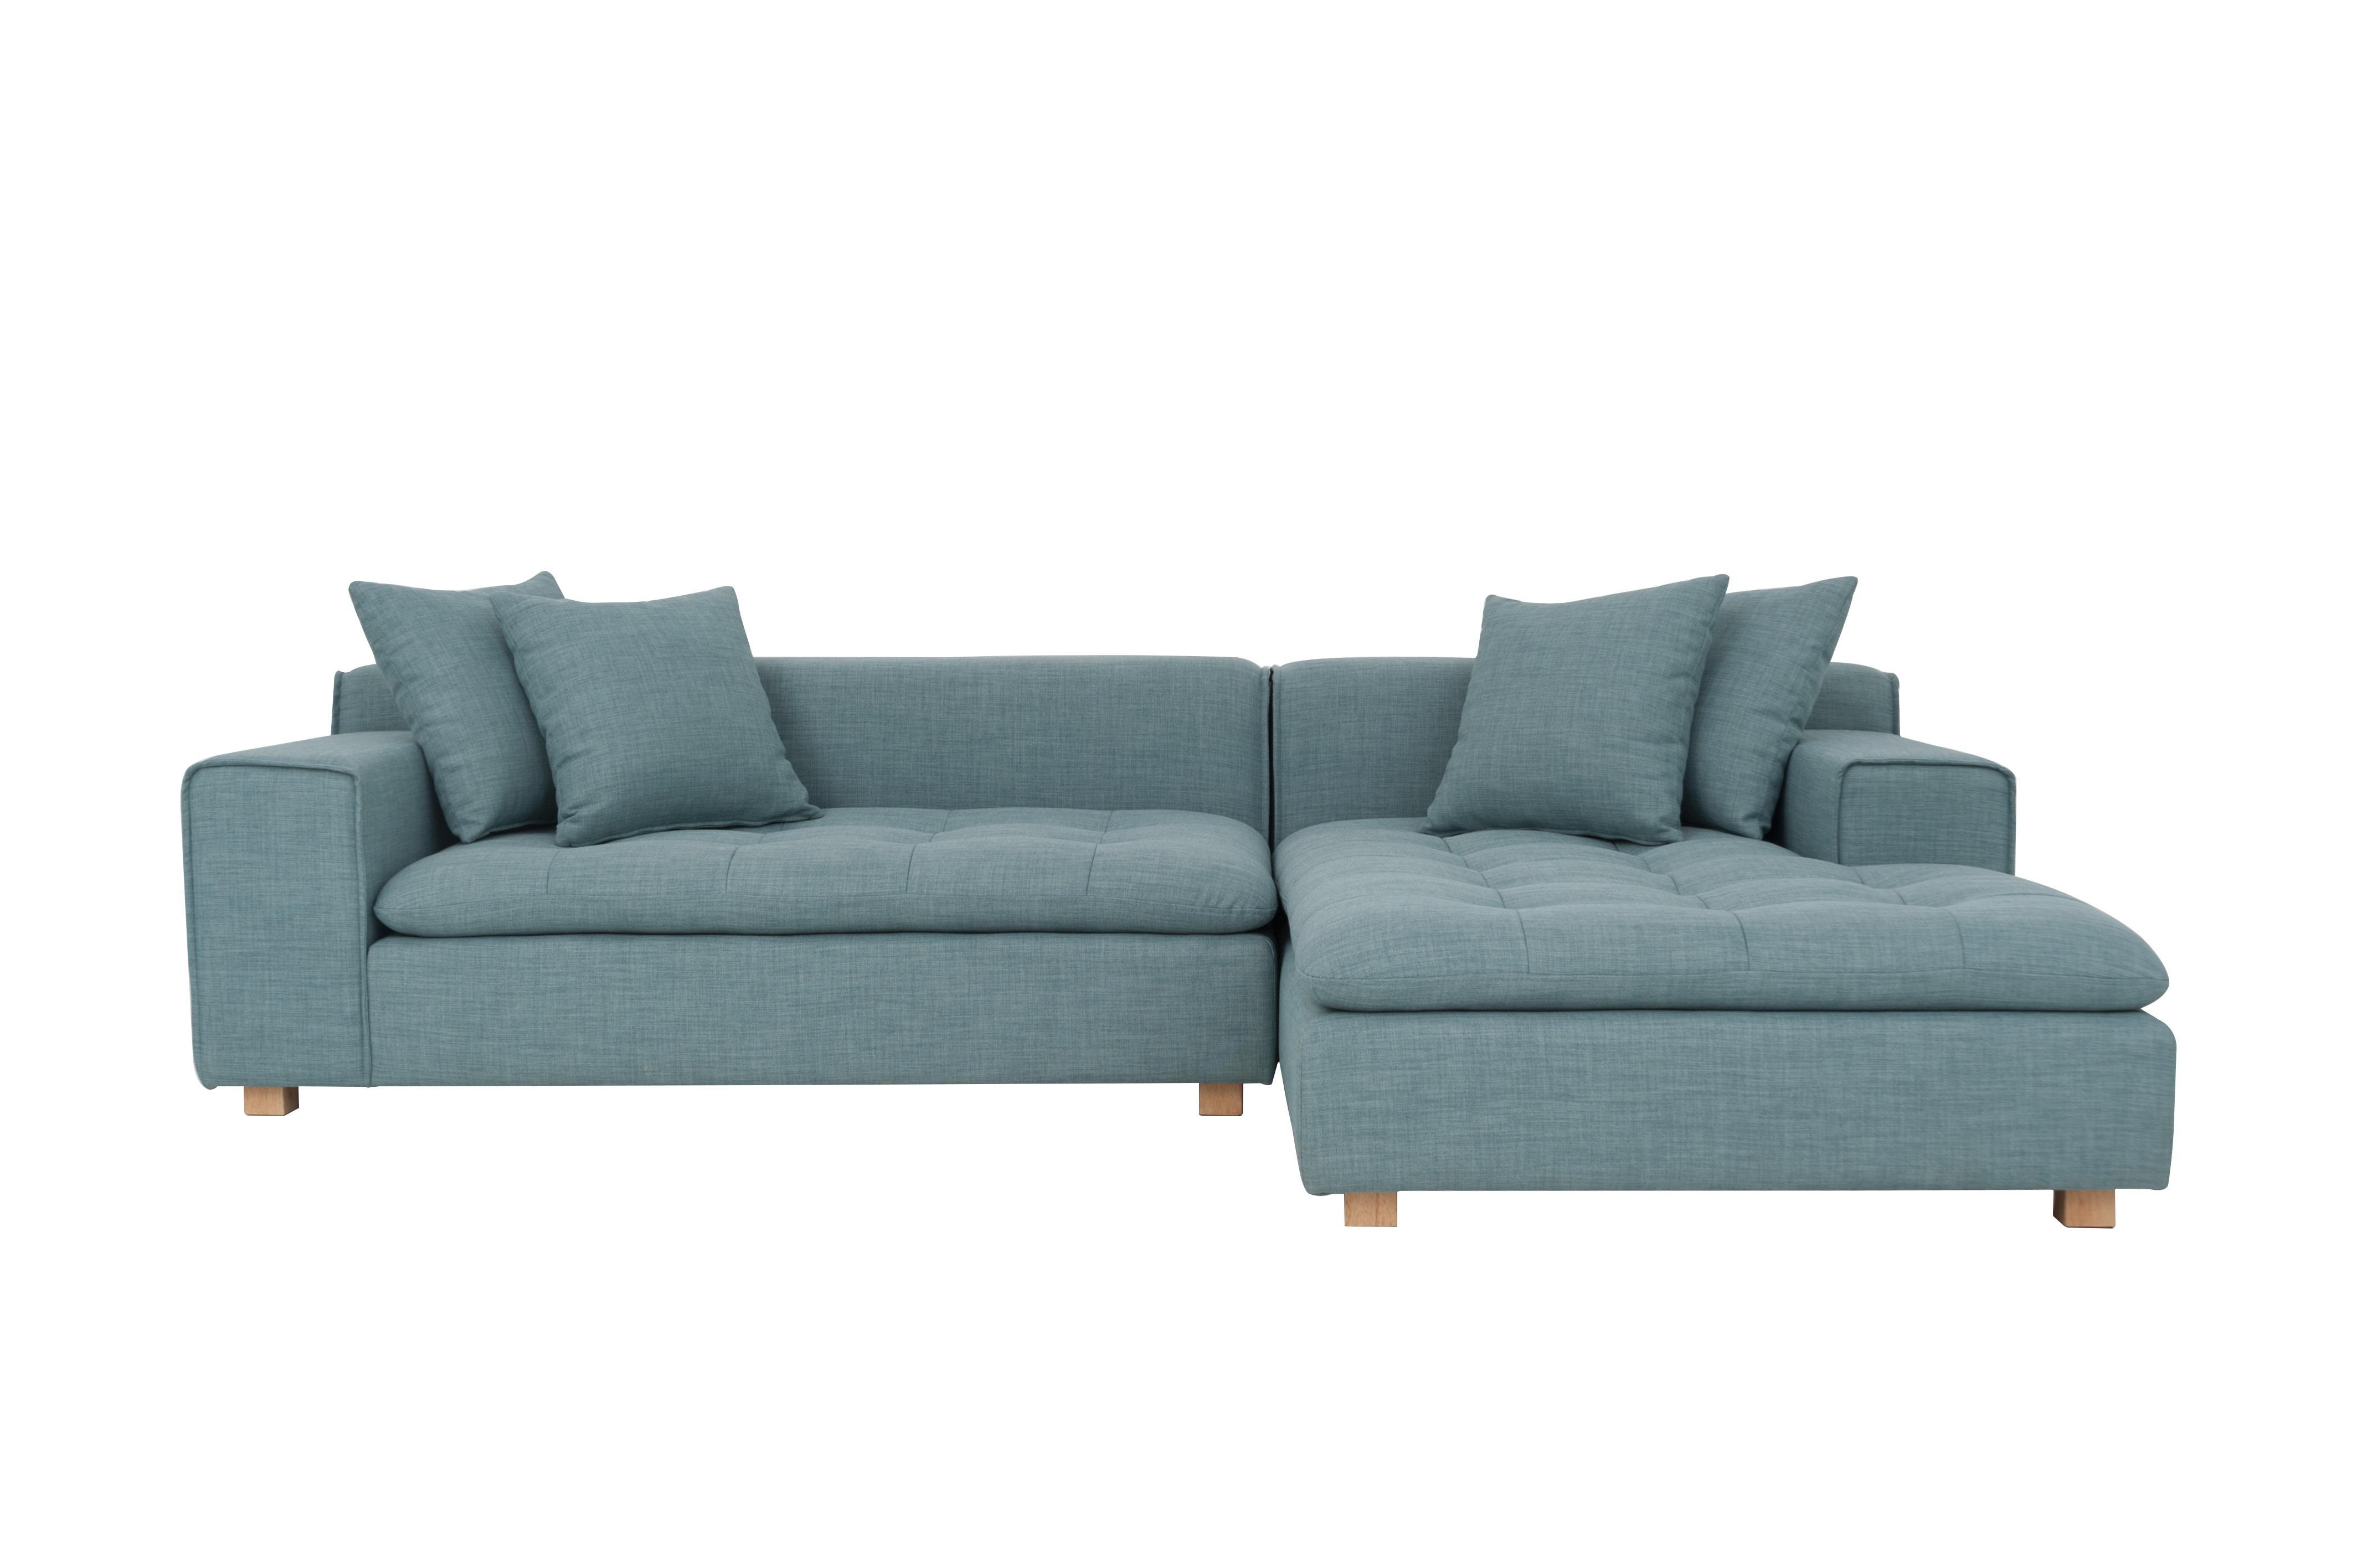 100% Top Grain Leather Sofa Set 100% Top Grain Leather Sofa Set